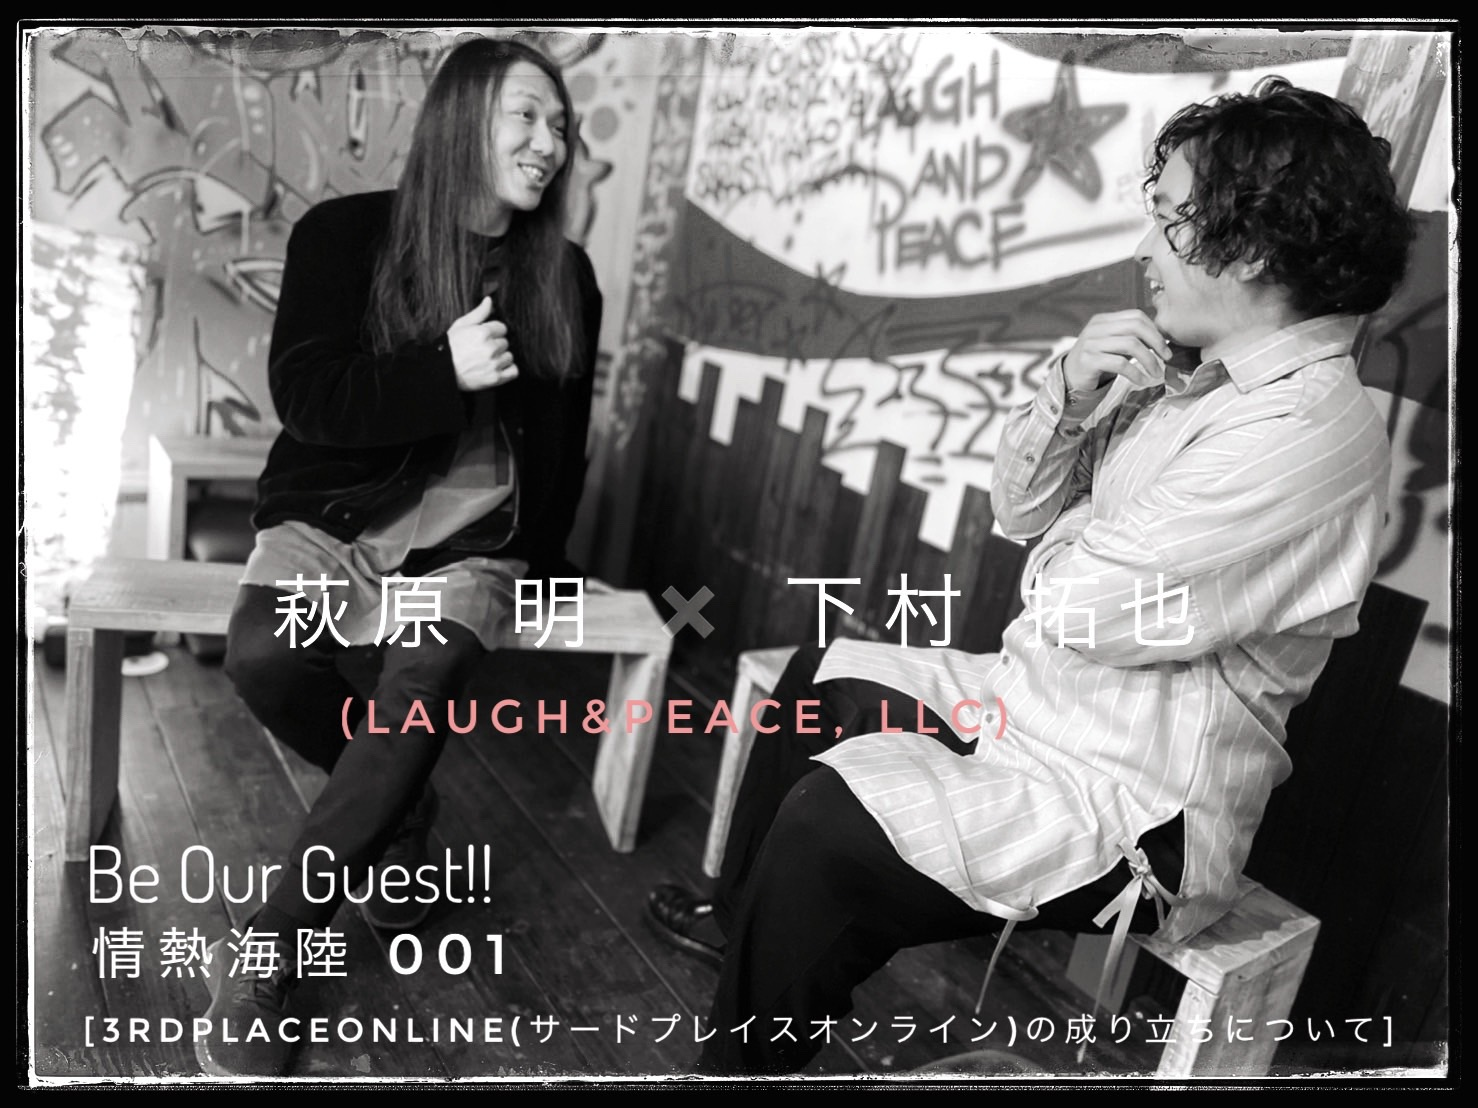 『Be Our Guest!!』情熱海陸:001【3rdPlaceOnline(サードプレイスオンライン)の成り立ちについて】